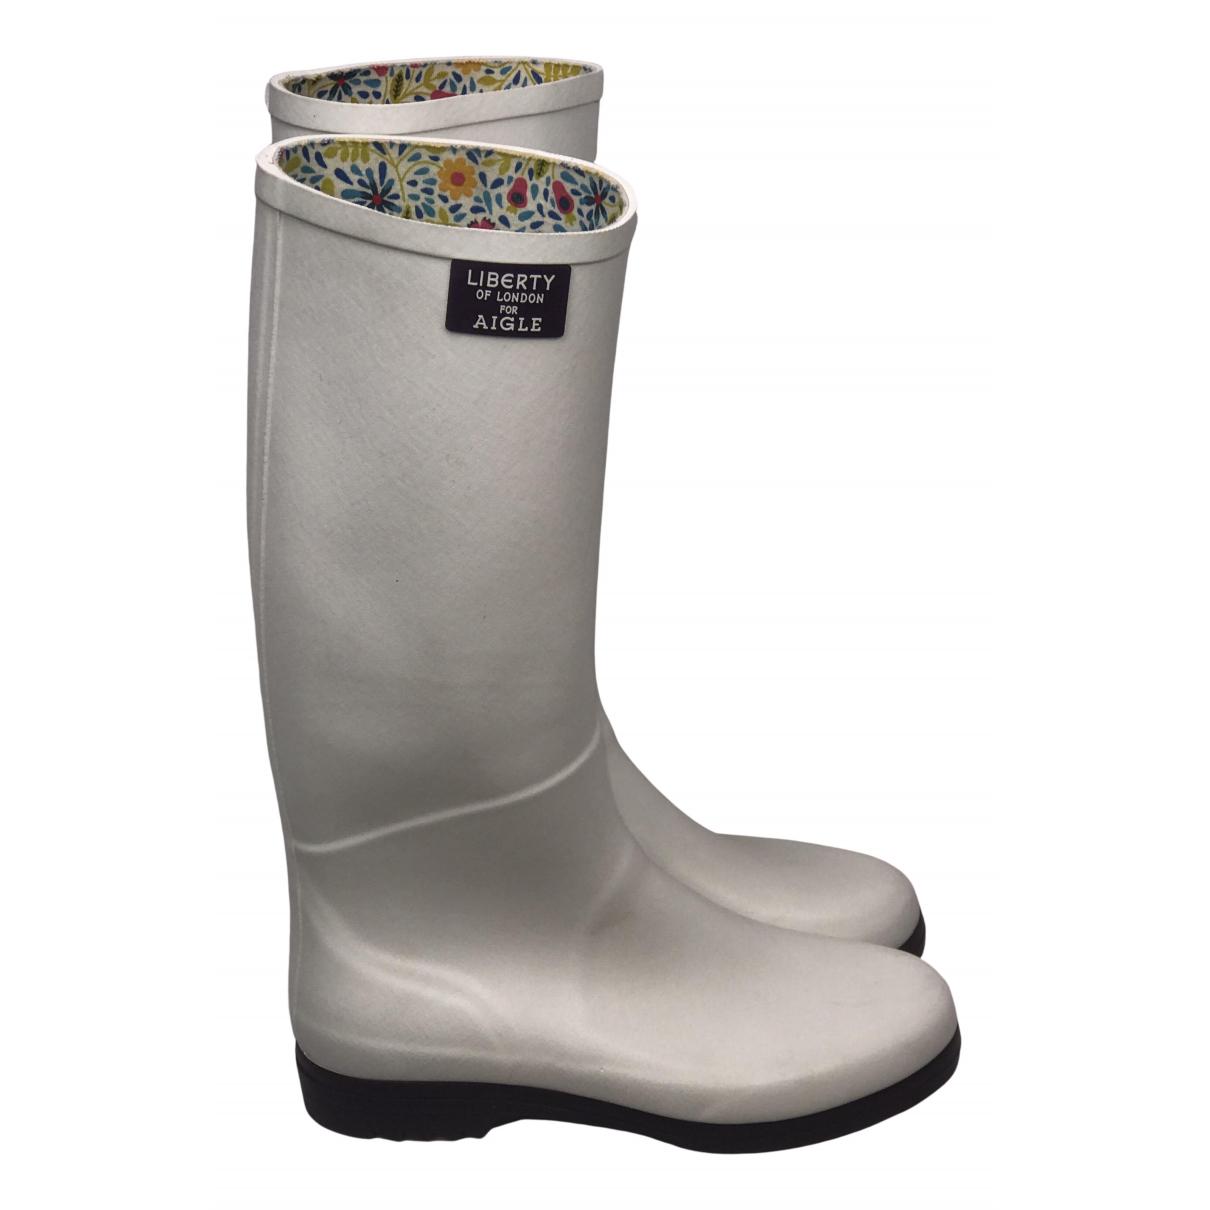 Aigle N White Rubber Boots for Women 37 EU